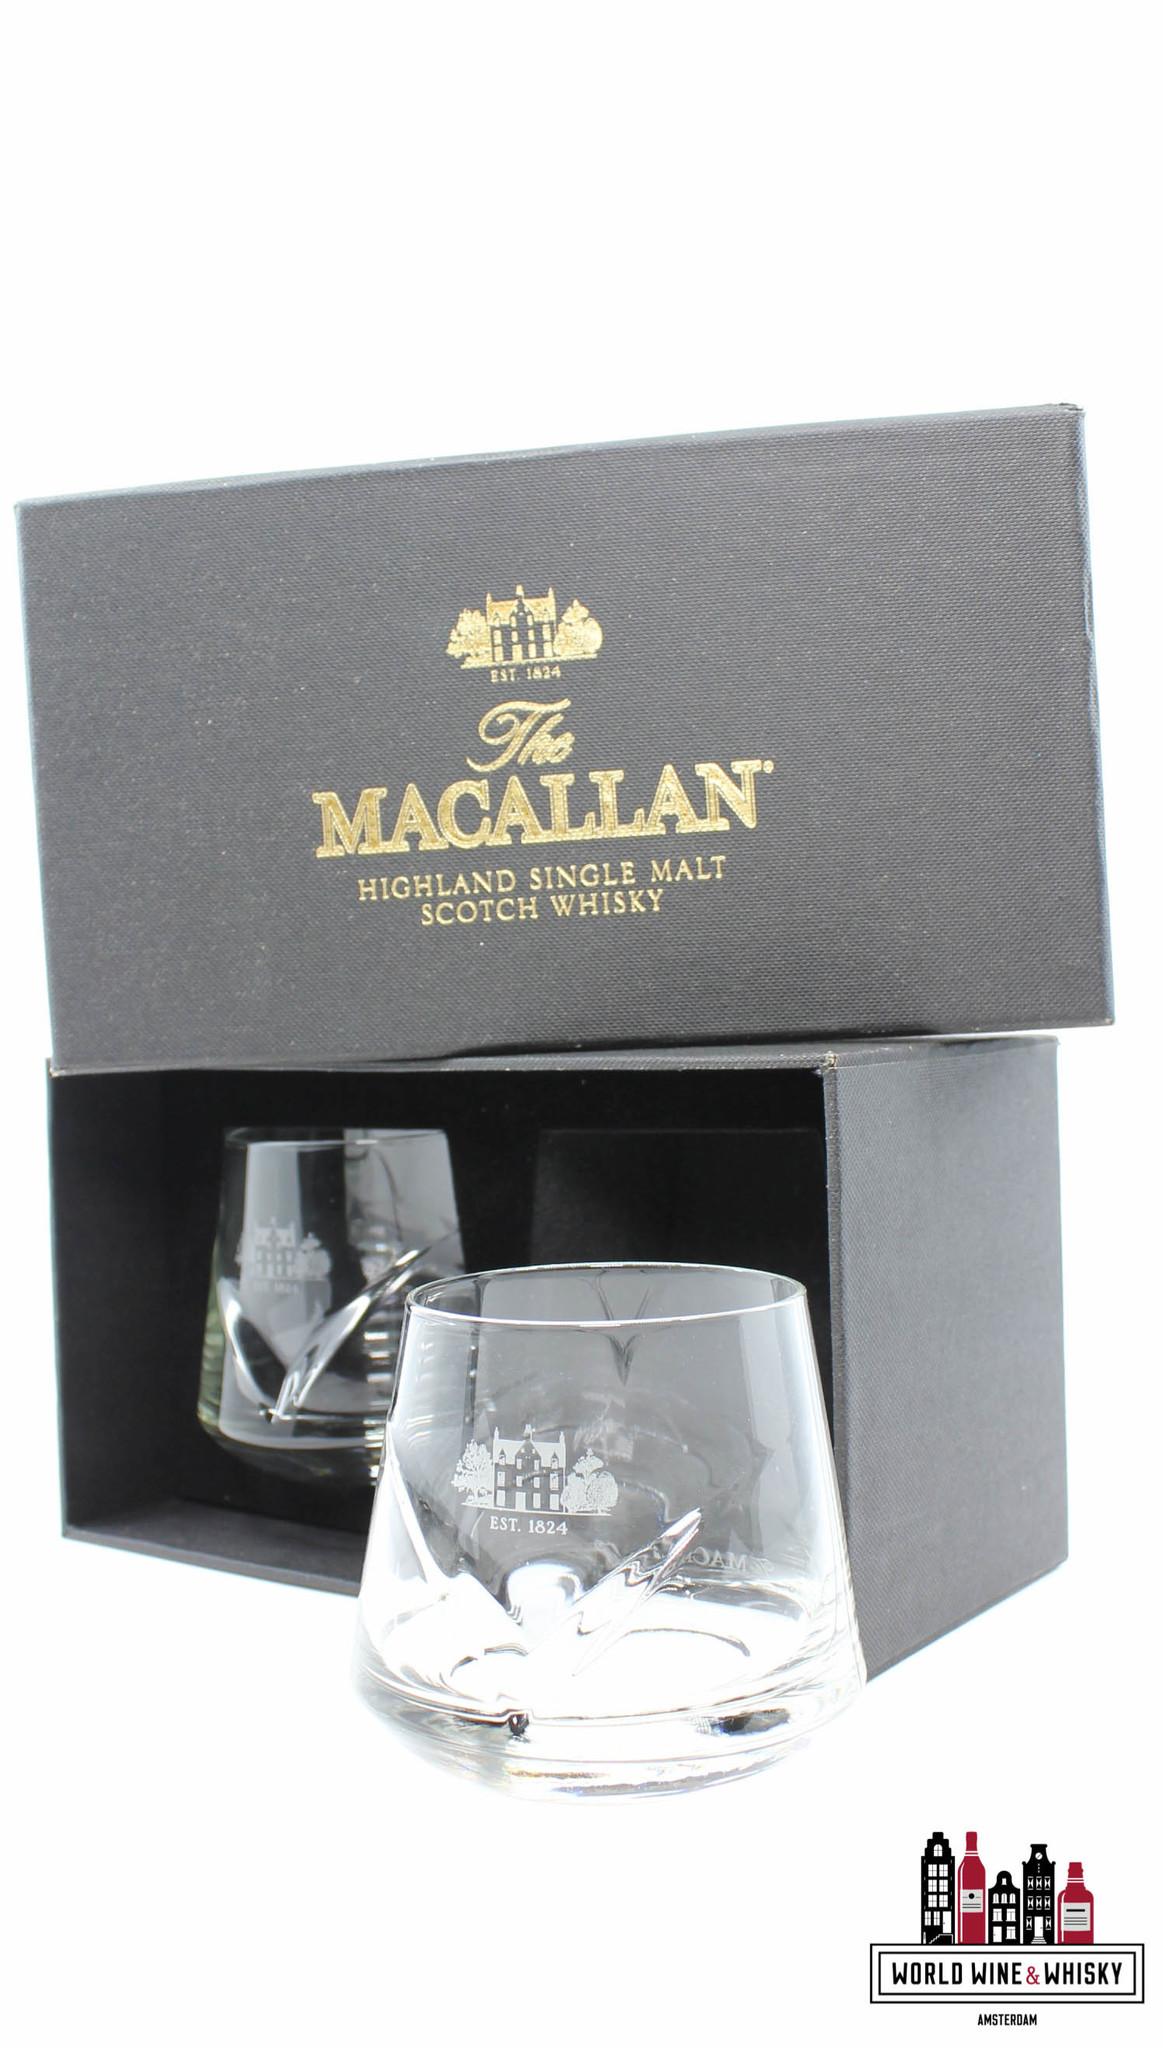 Macallan Macallan chevron tumblers gift box set (2 glasses)